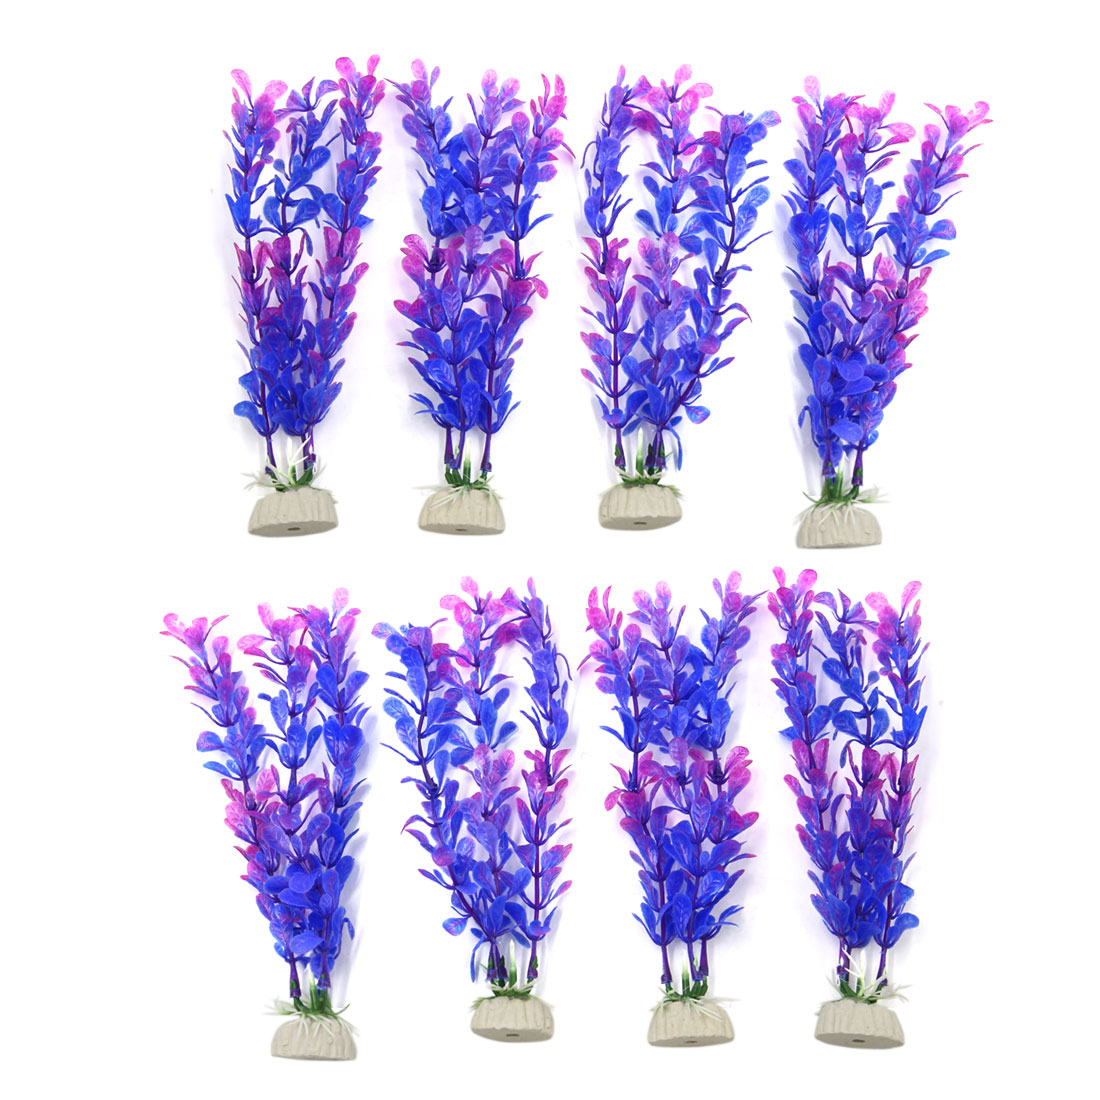 8pcs Purple Plastic Aquarium Plants Fish Tank Water Plant Decoration Ornament